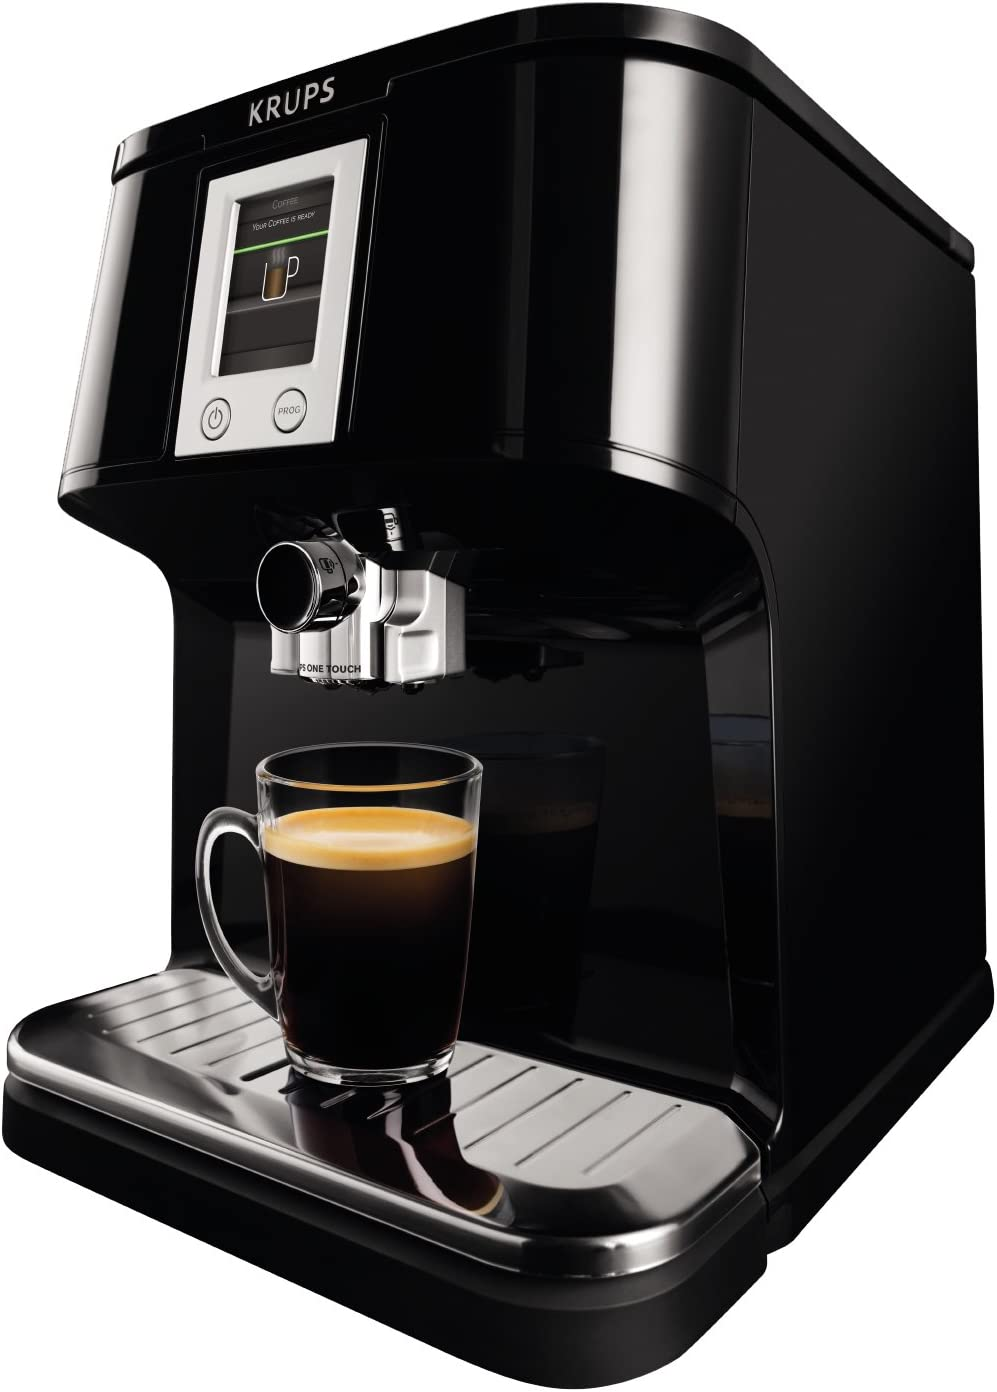 Krups EA850B - Cafetera (Independiente, Negro, Espresso machine, Granos de café, Capuchino, Café expreso, Latte macchiato, Ristretto, 1,7L): Amazon.es: Hogar